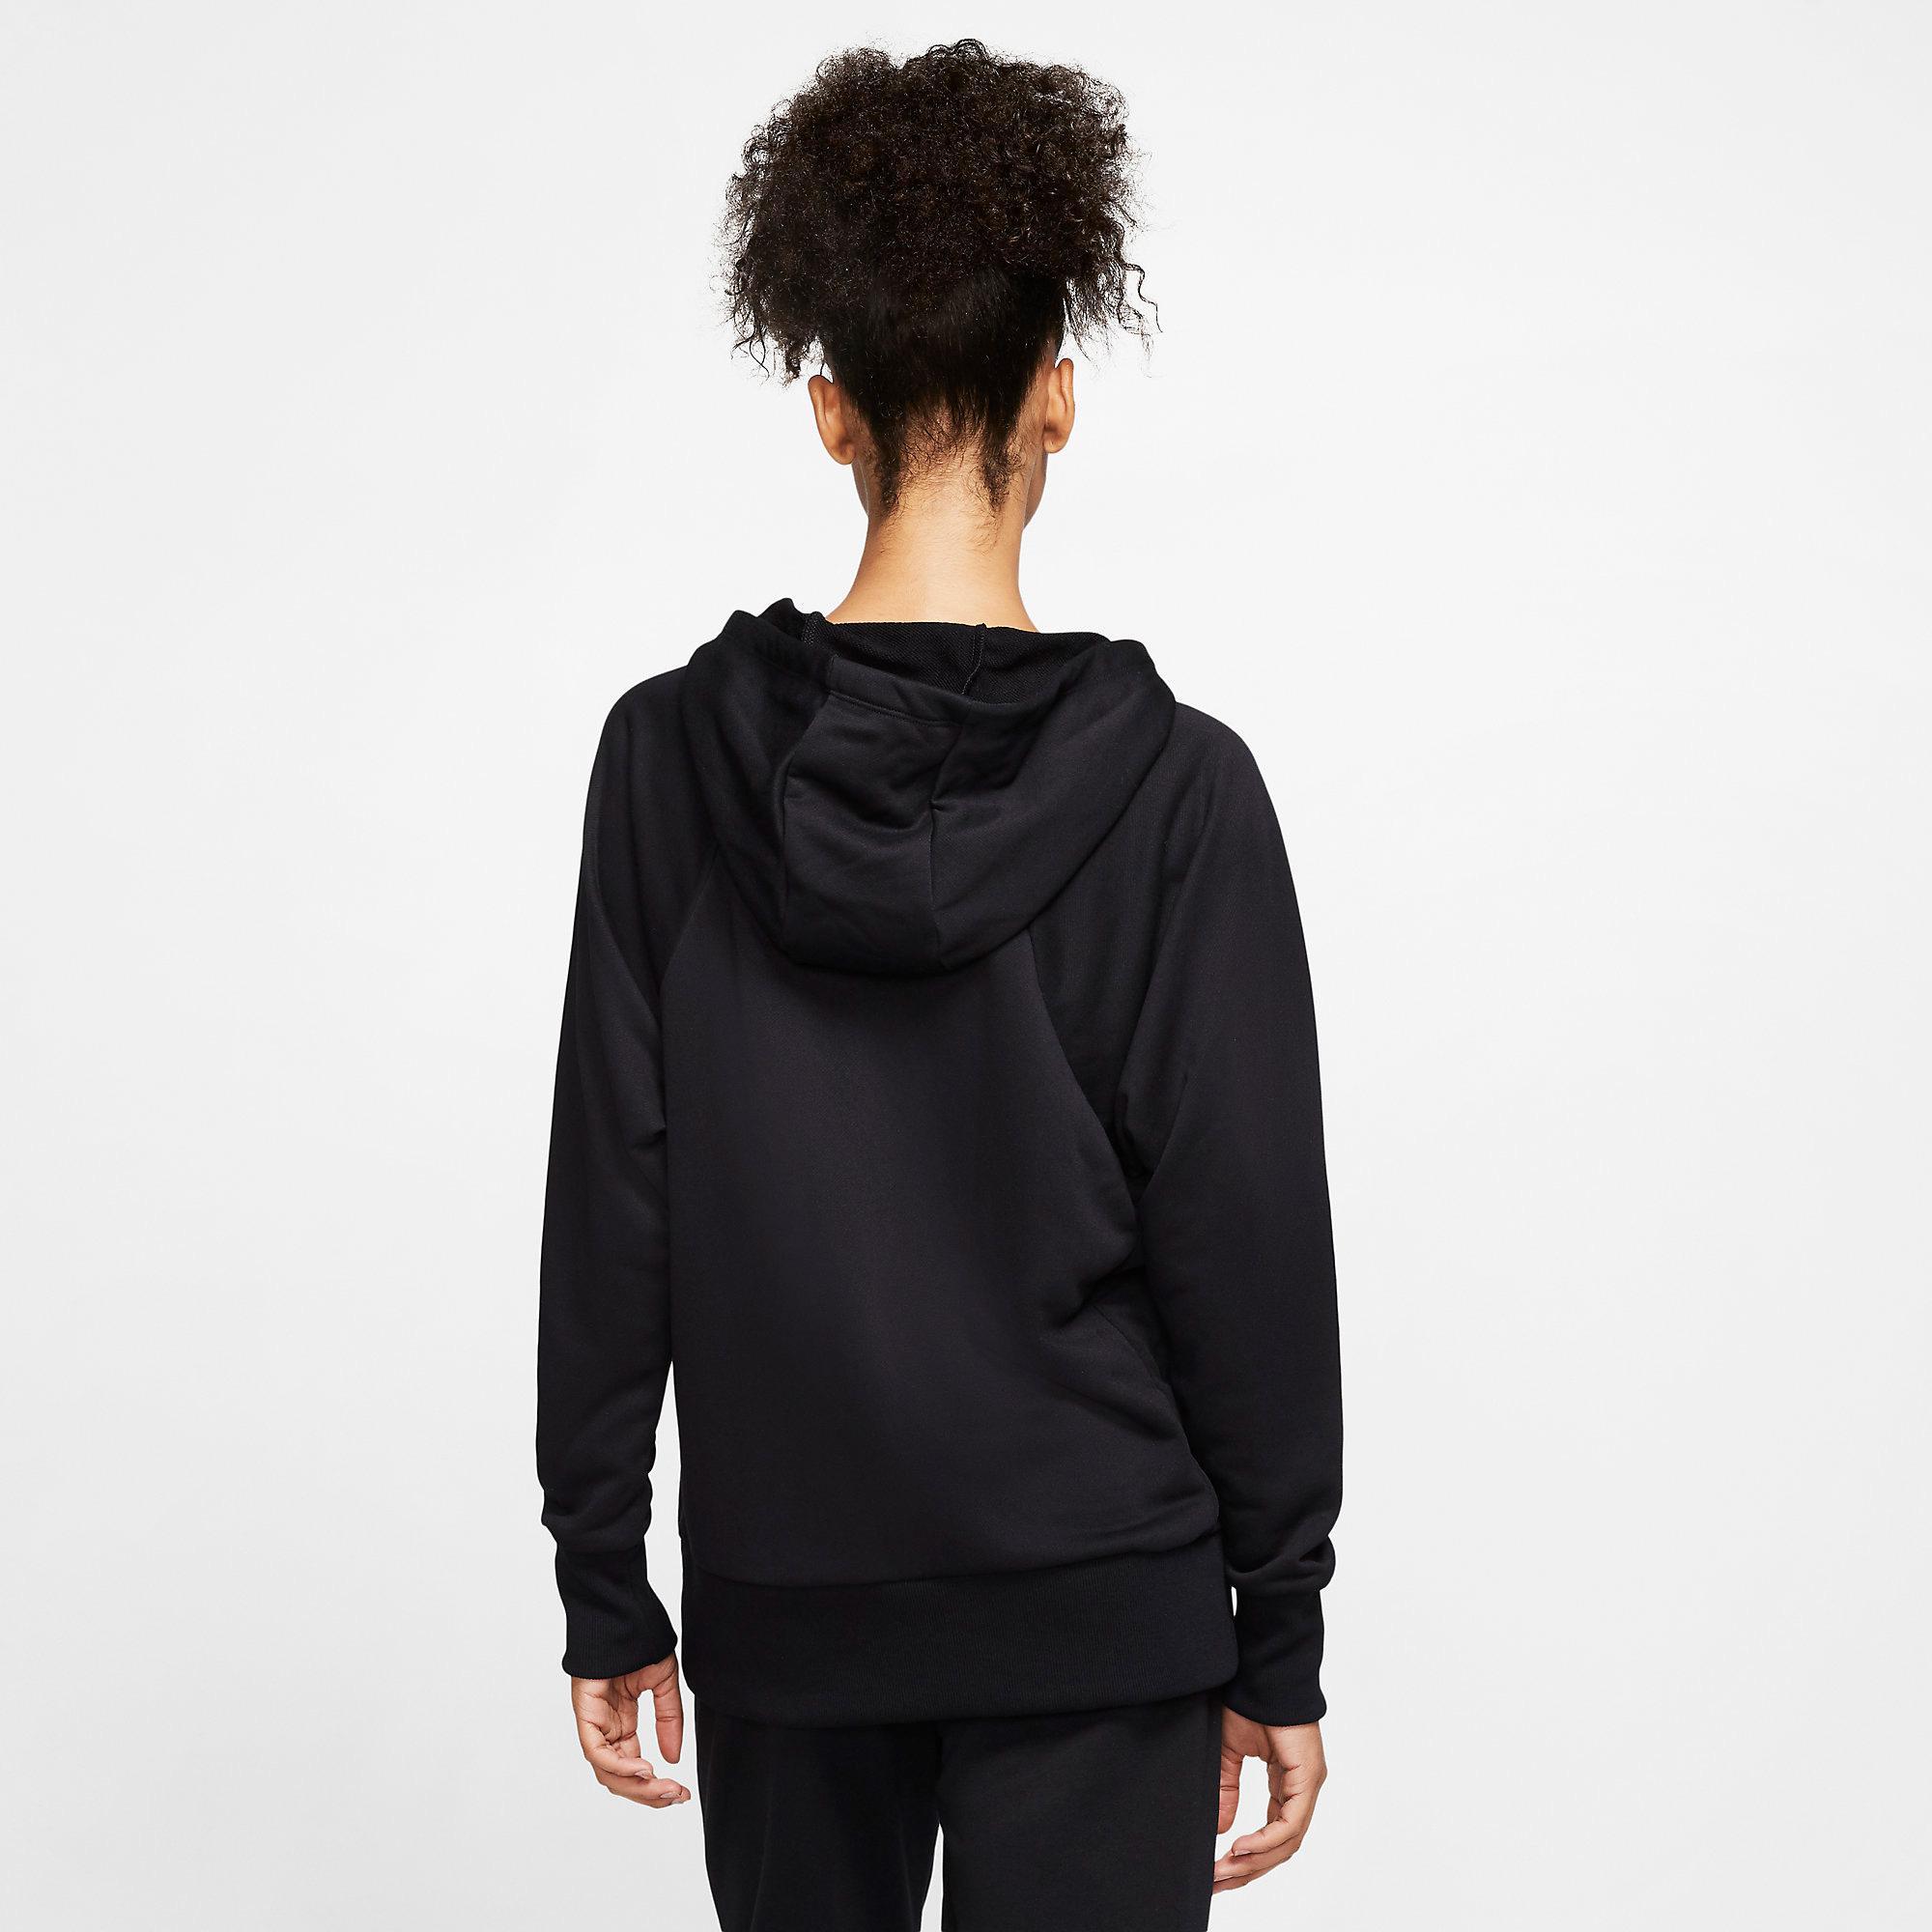 Nike Womens Dri-FIT Training Hoodie